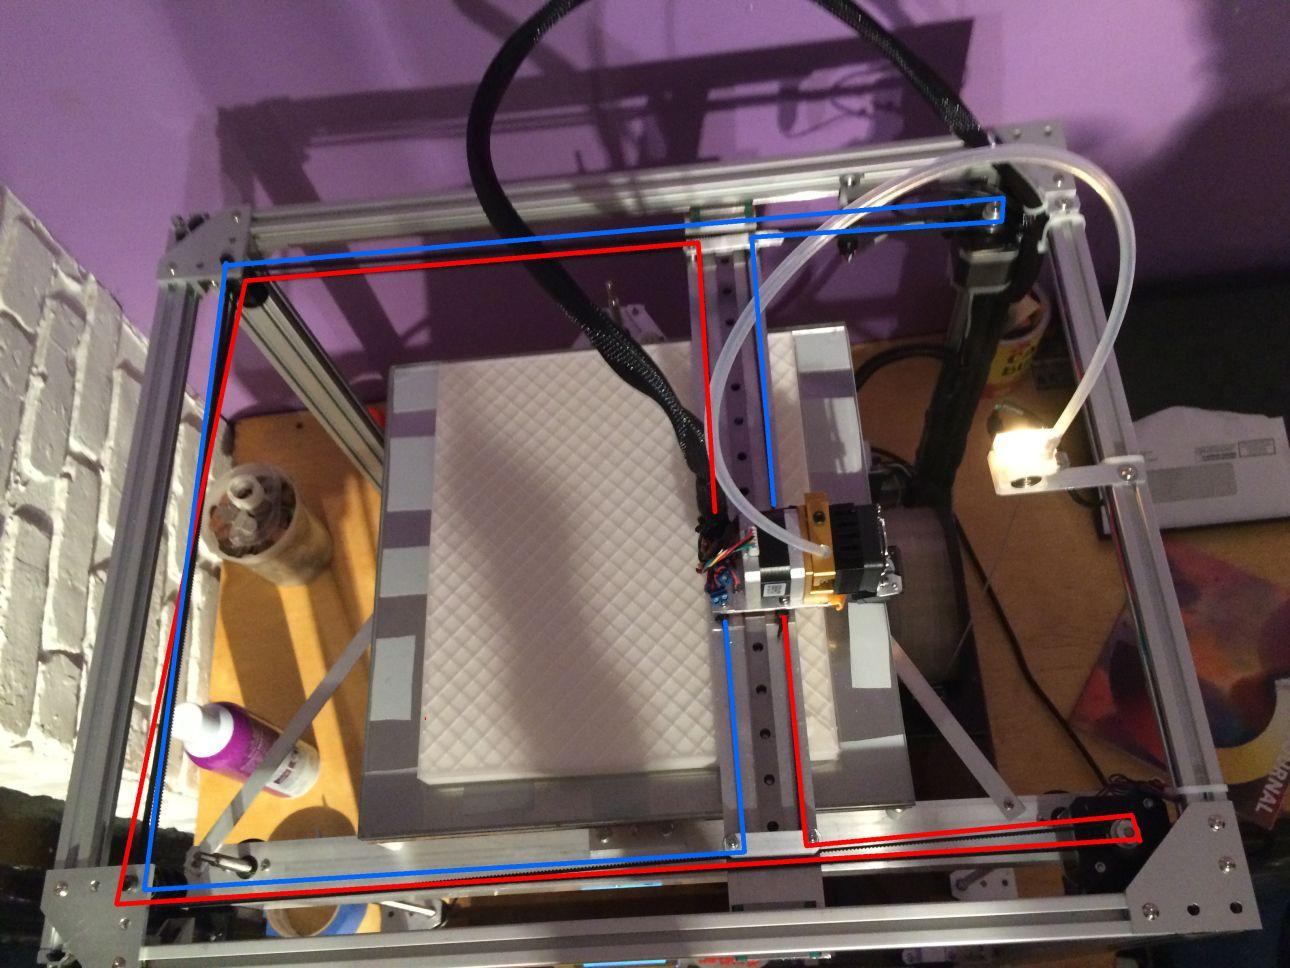 Maker Profile The Maestro of 3D Printer Building Jetguy